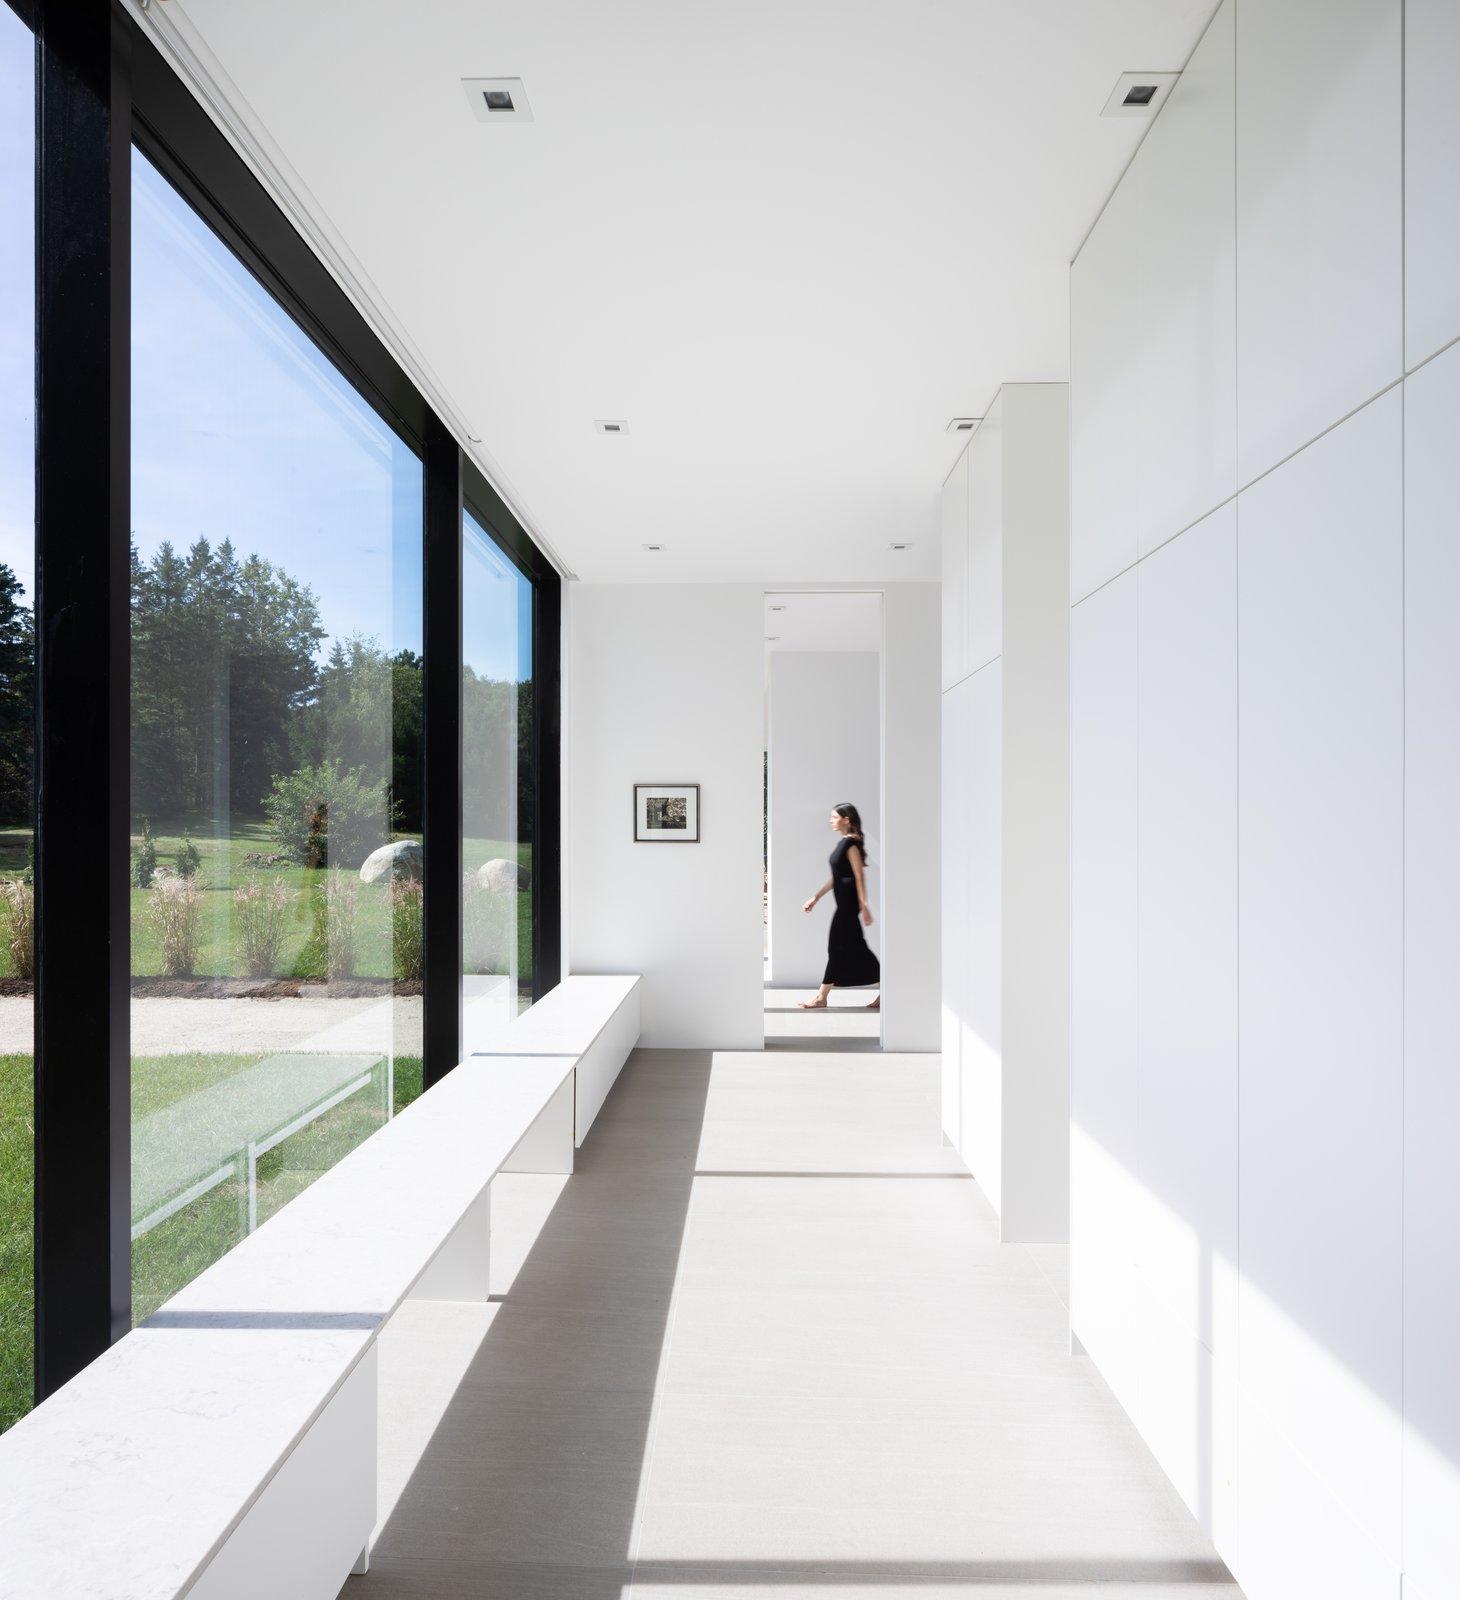 Teph Inlet daylit hallway